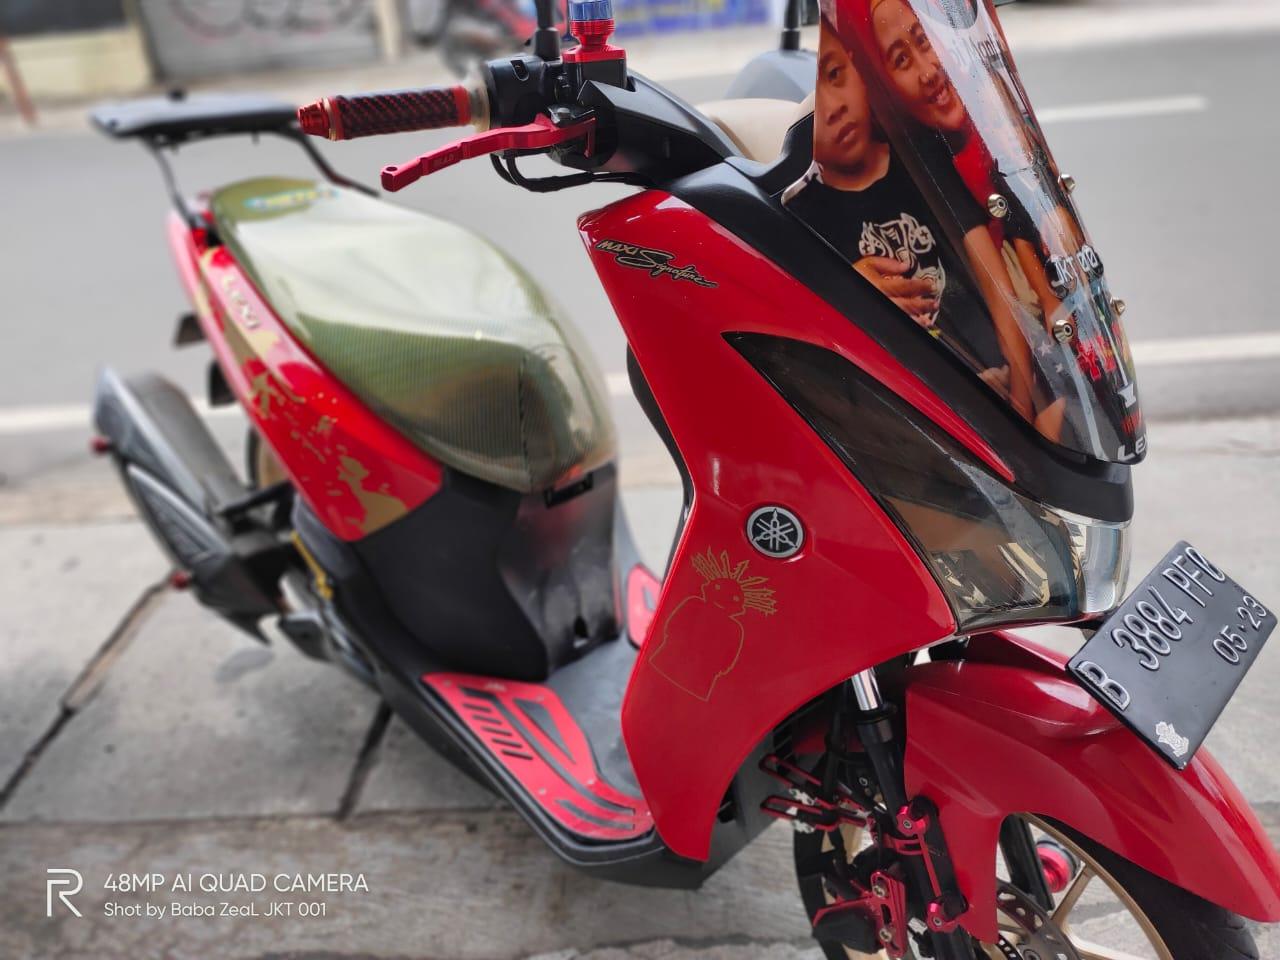 Yamaha Lexi Bore Up 155cc Terbukti Irit, 1 Liter BBM Tembus 62 KM